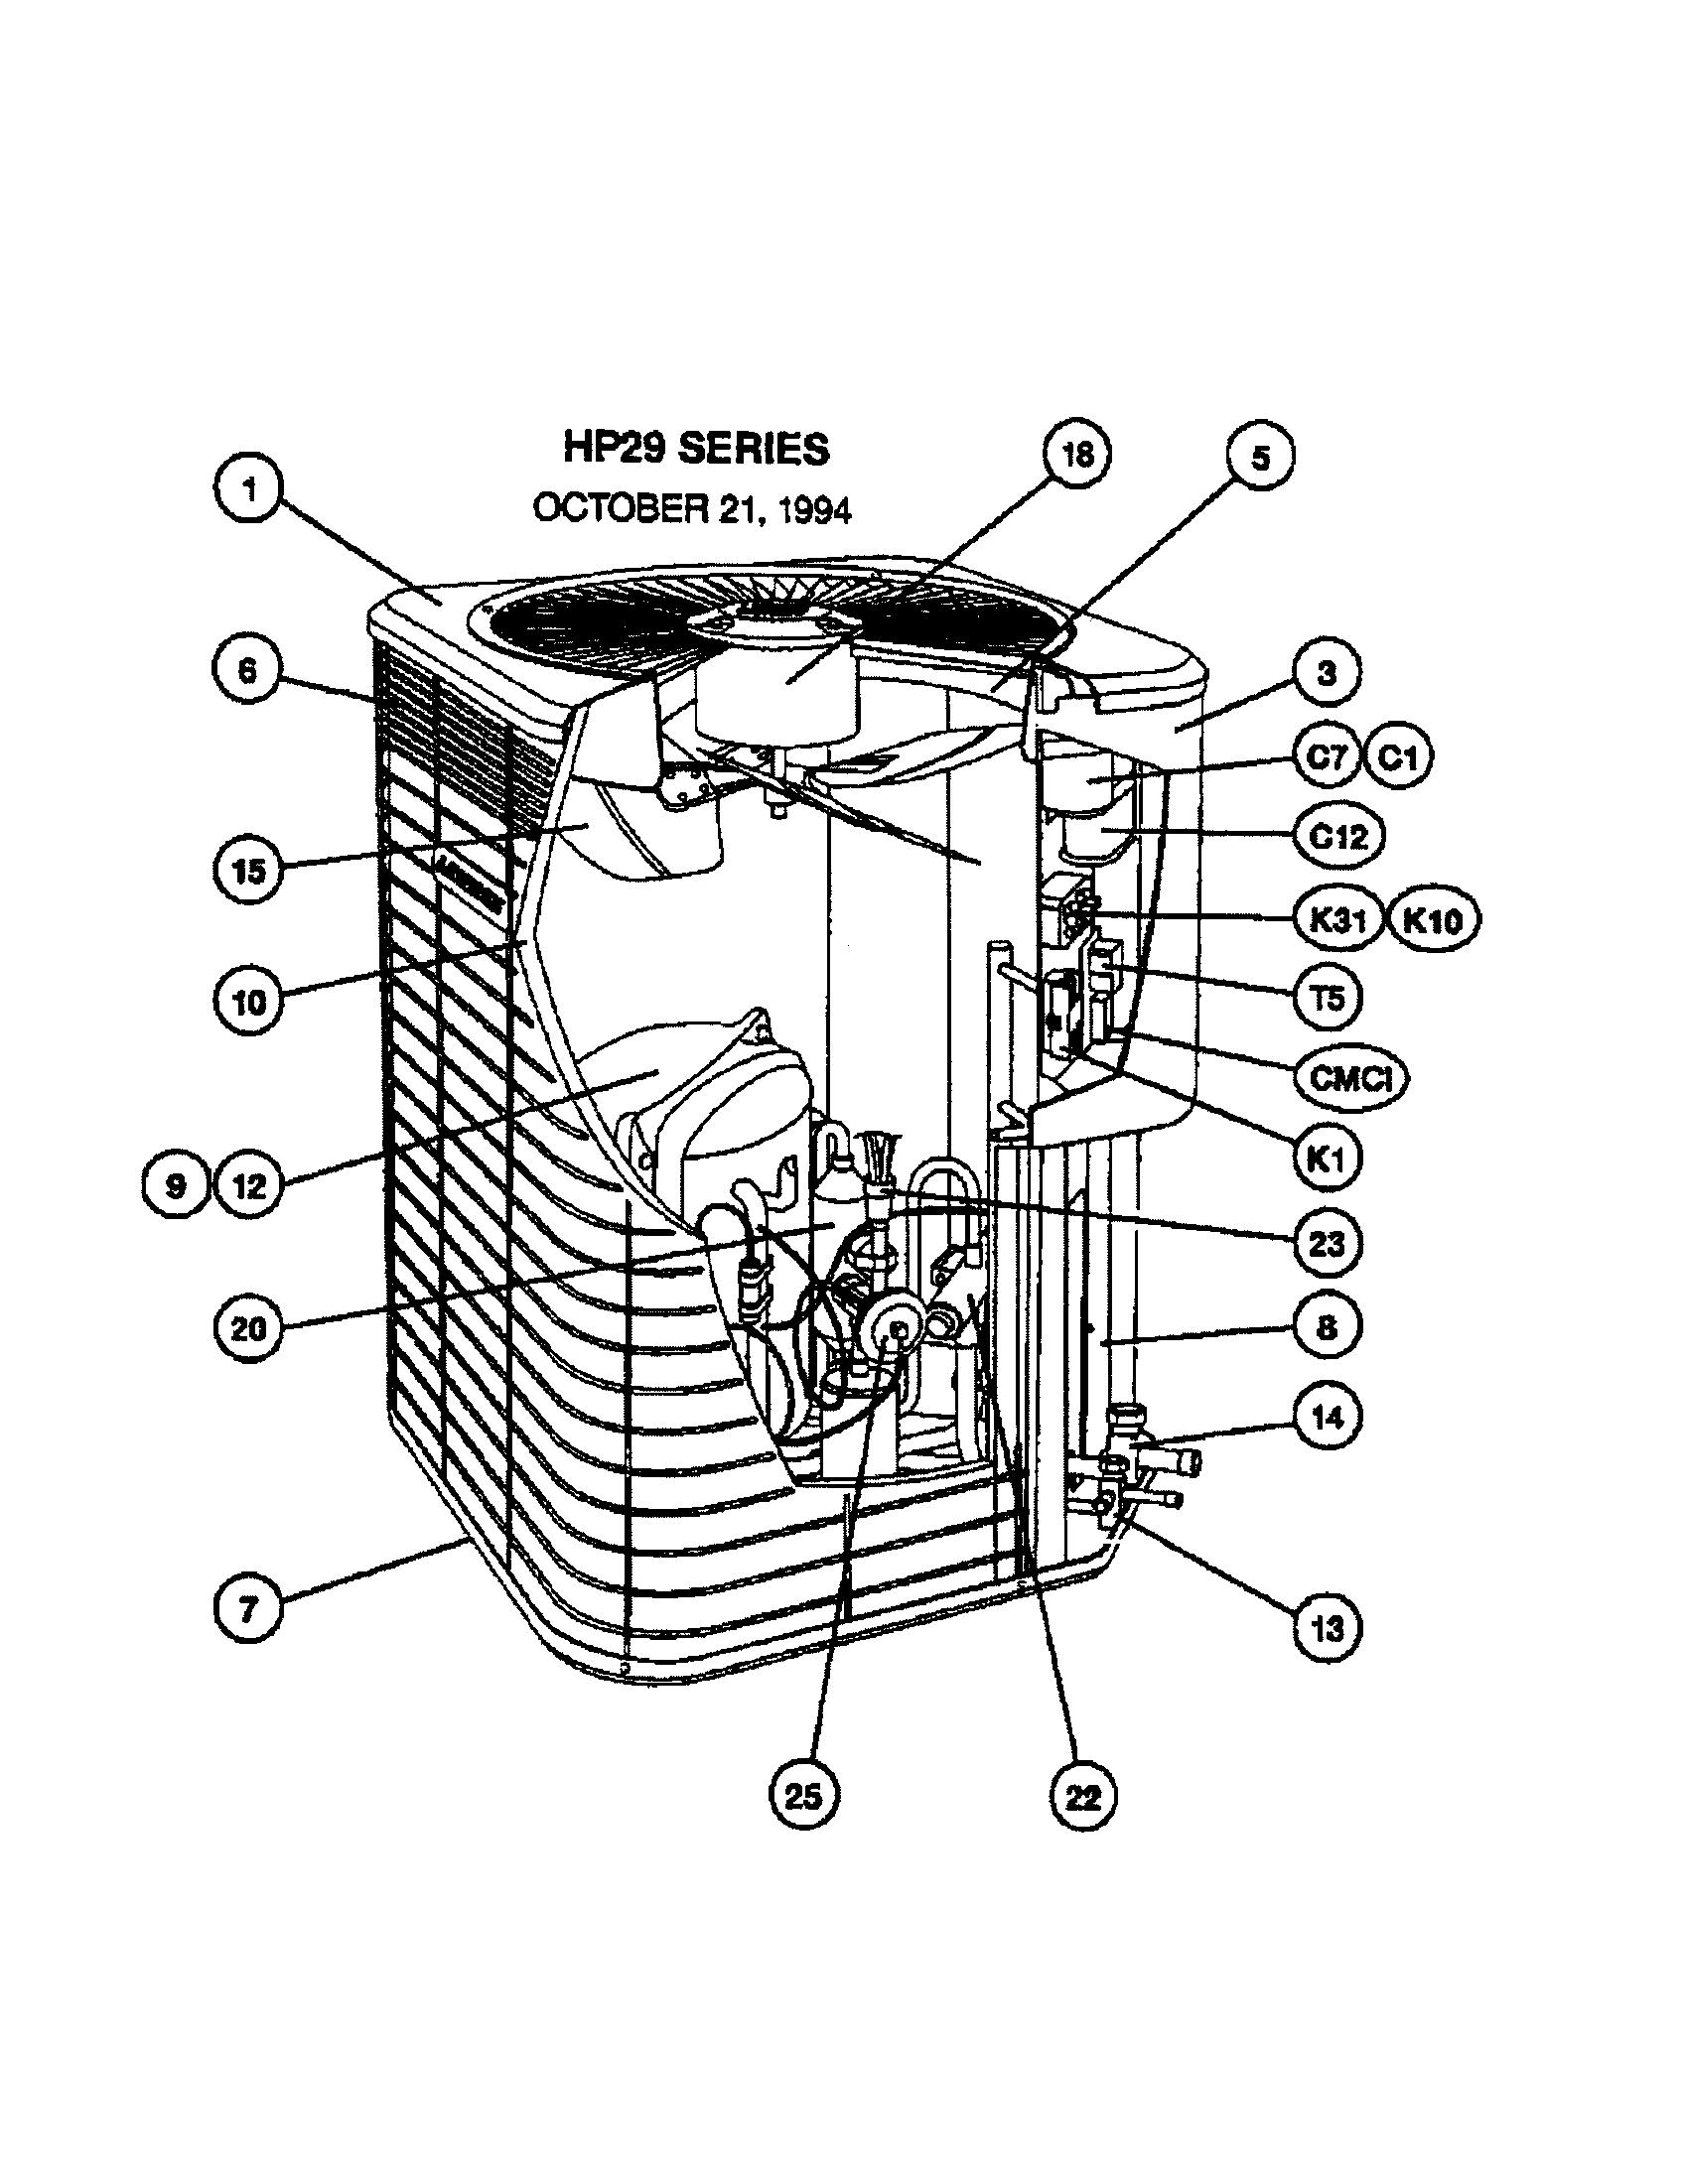 hight resolution of hvac compressor wiring diagram hvac discover your wiring diagram lennox heat pump contactor wiring diagram pressor